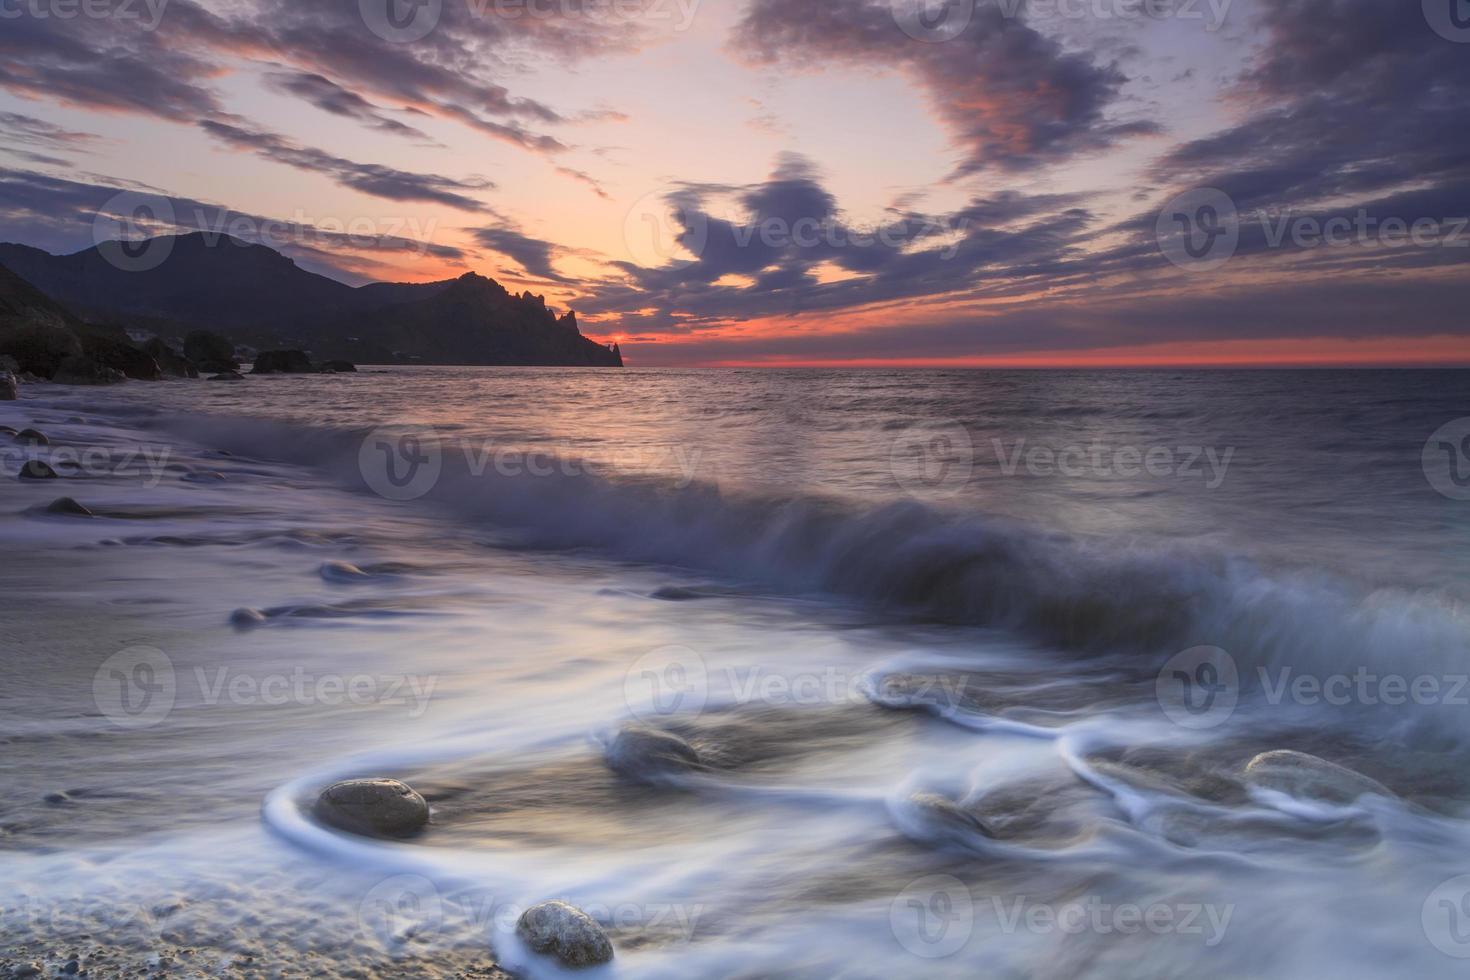 bel tramonto su una spiaggia di sabbia foto